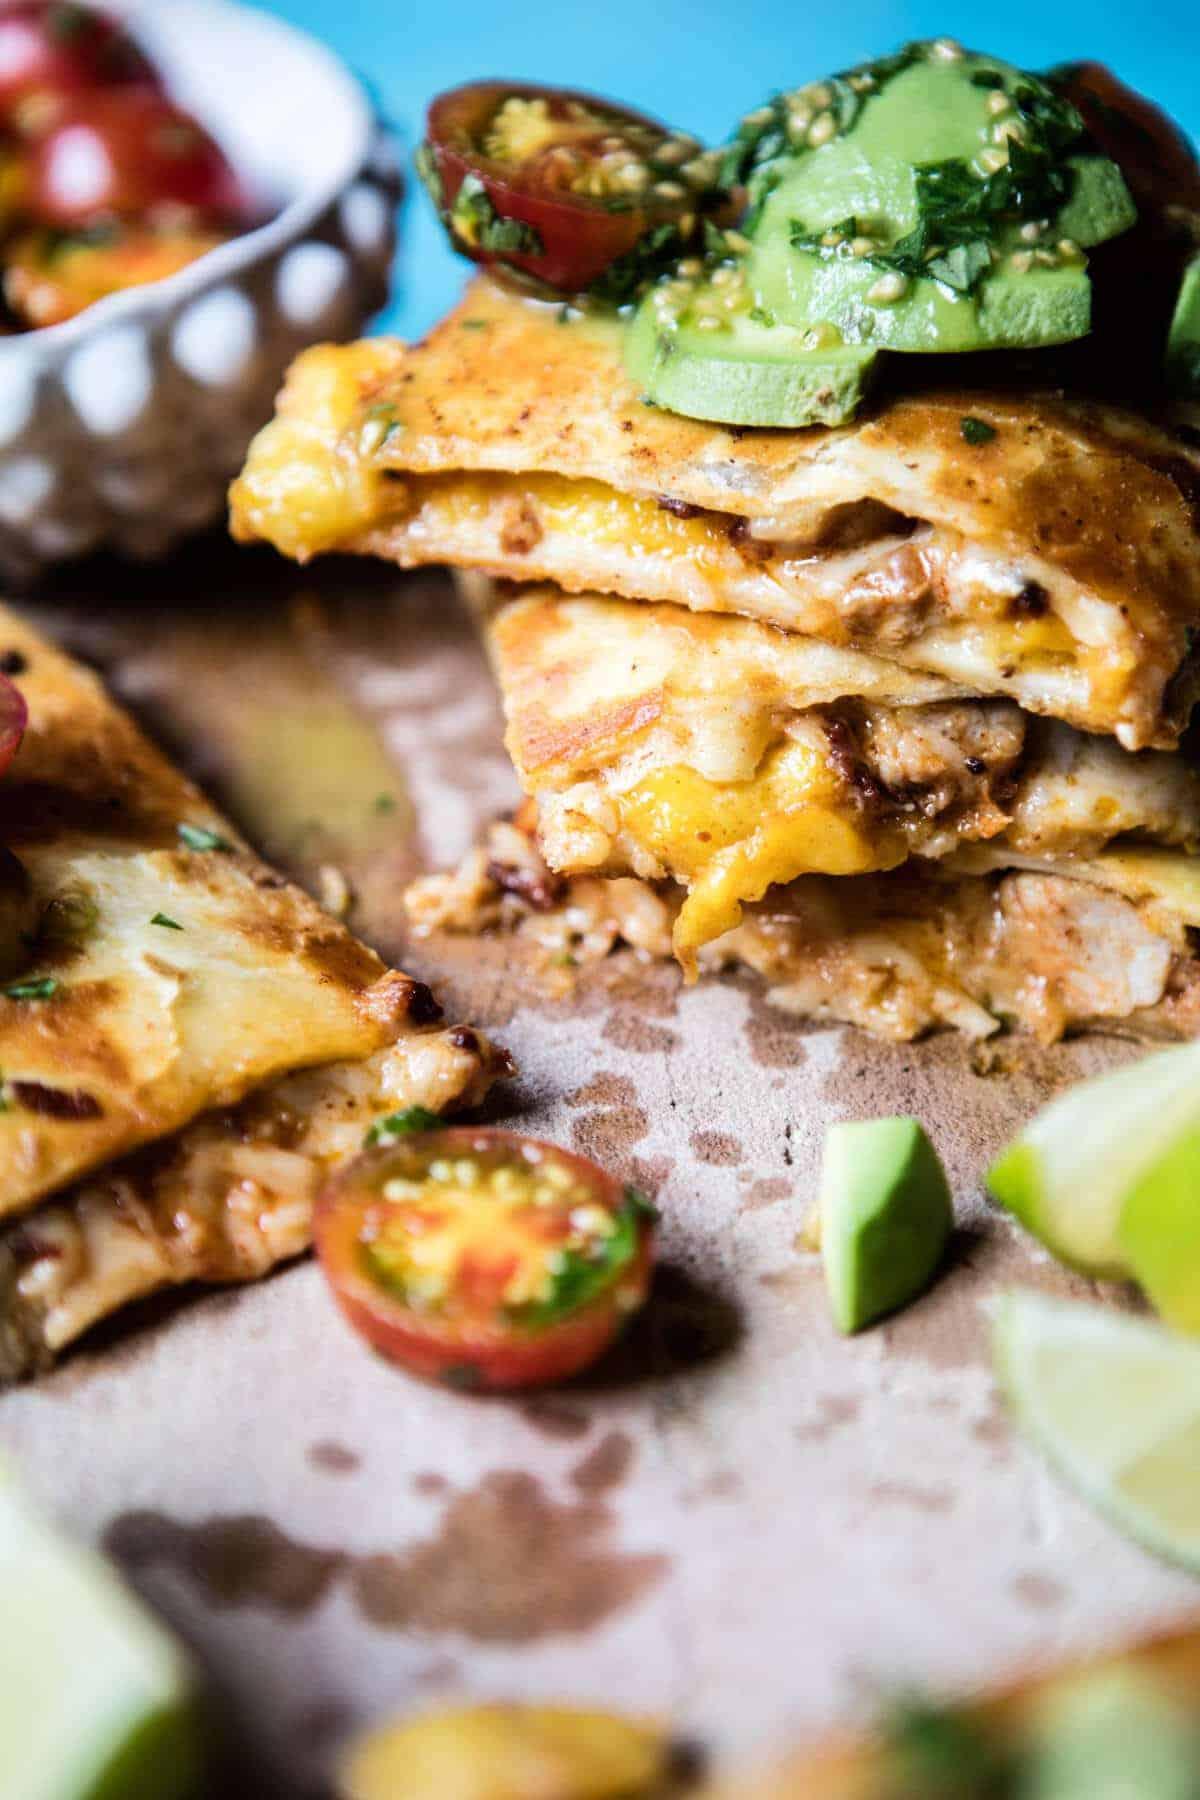 Applewood Smoked Mango Pork Quesadilla | halfbakedharvest.com @hbharvest